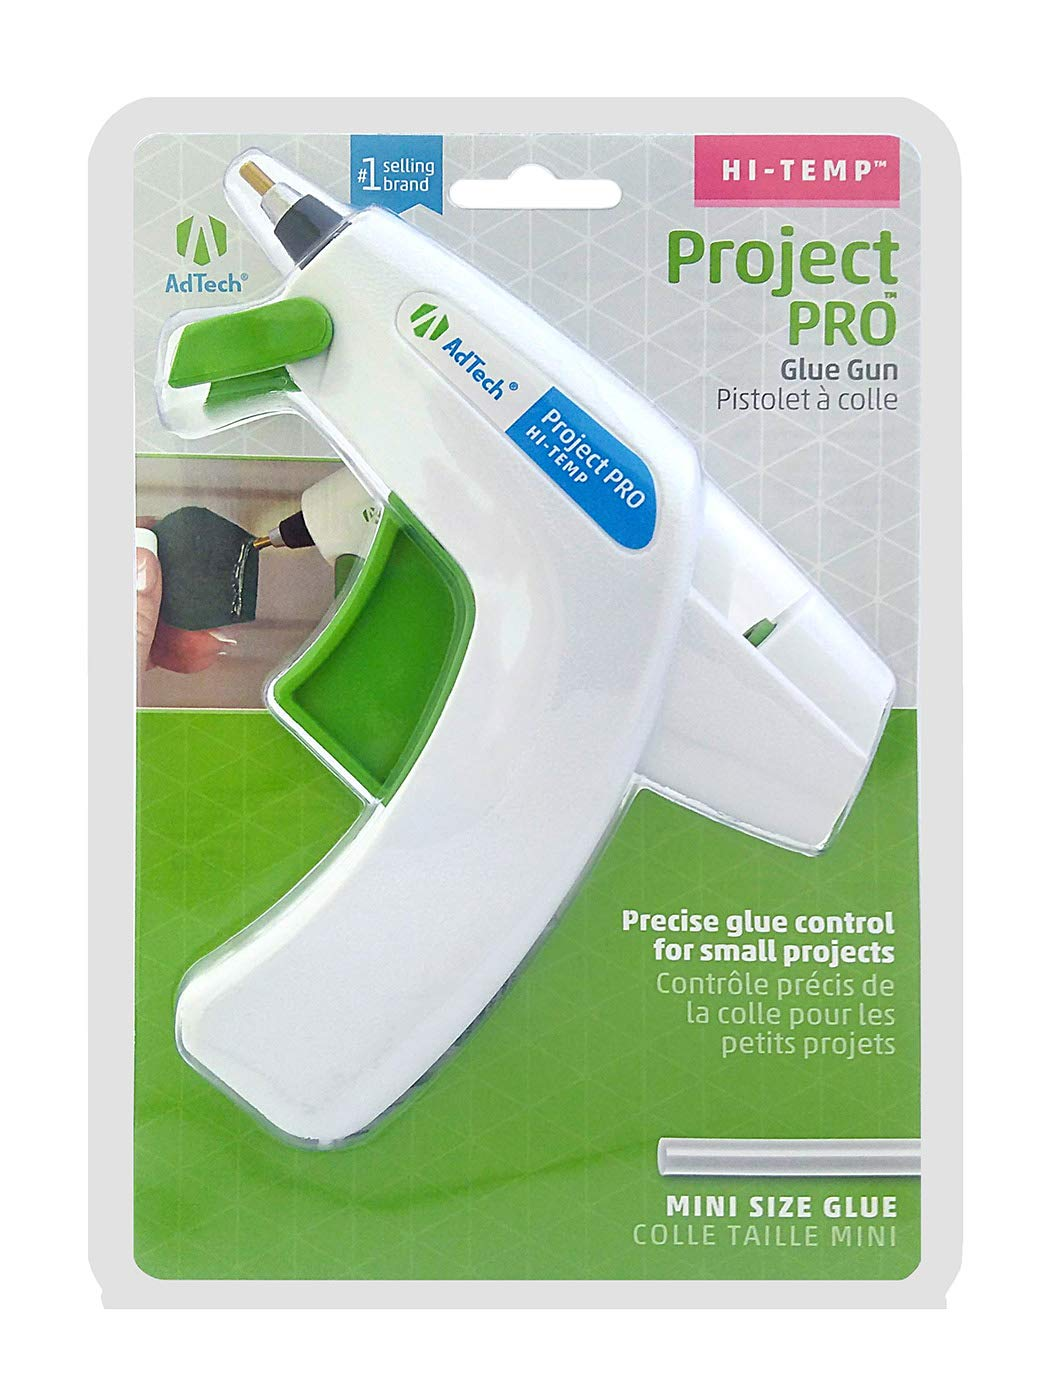 Clear Glue Sticks and Glue Runner AdTech W05643 Crafters Gift Pack with Detailer Glue Gun